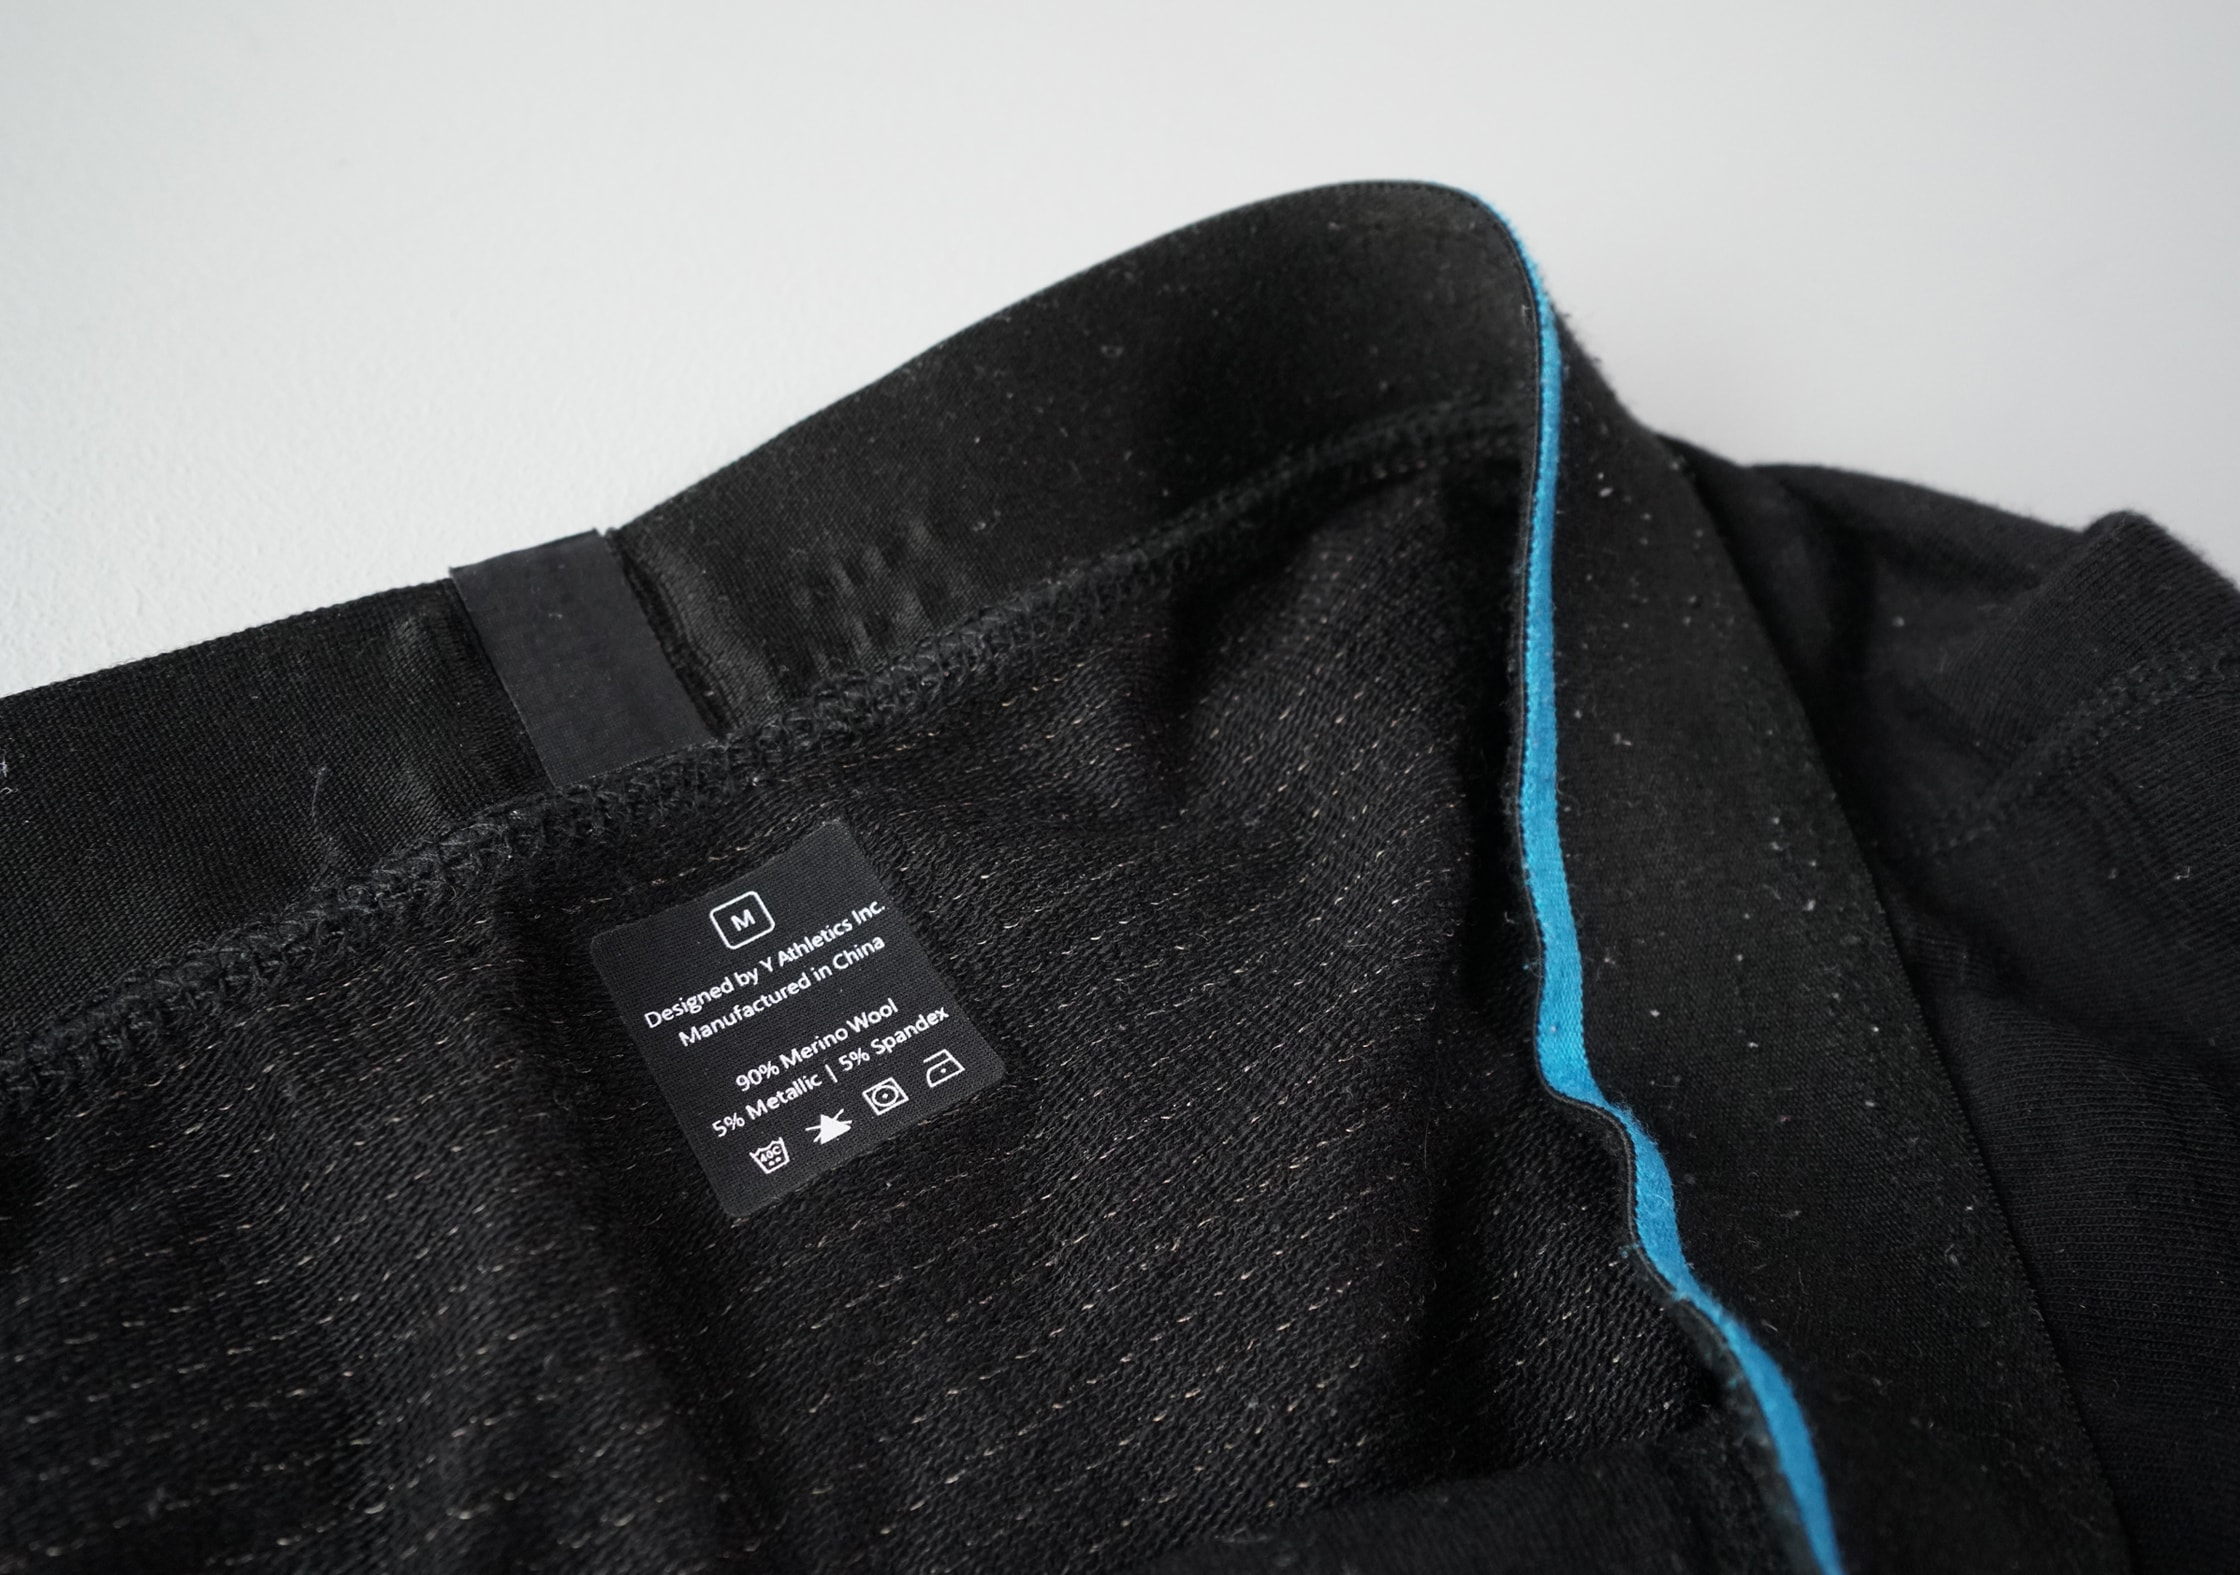 Y Athletics Merino Wool Boxer Brief Metallic Lining Tech